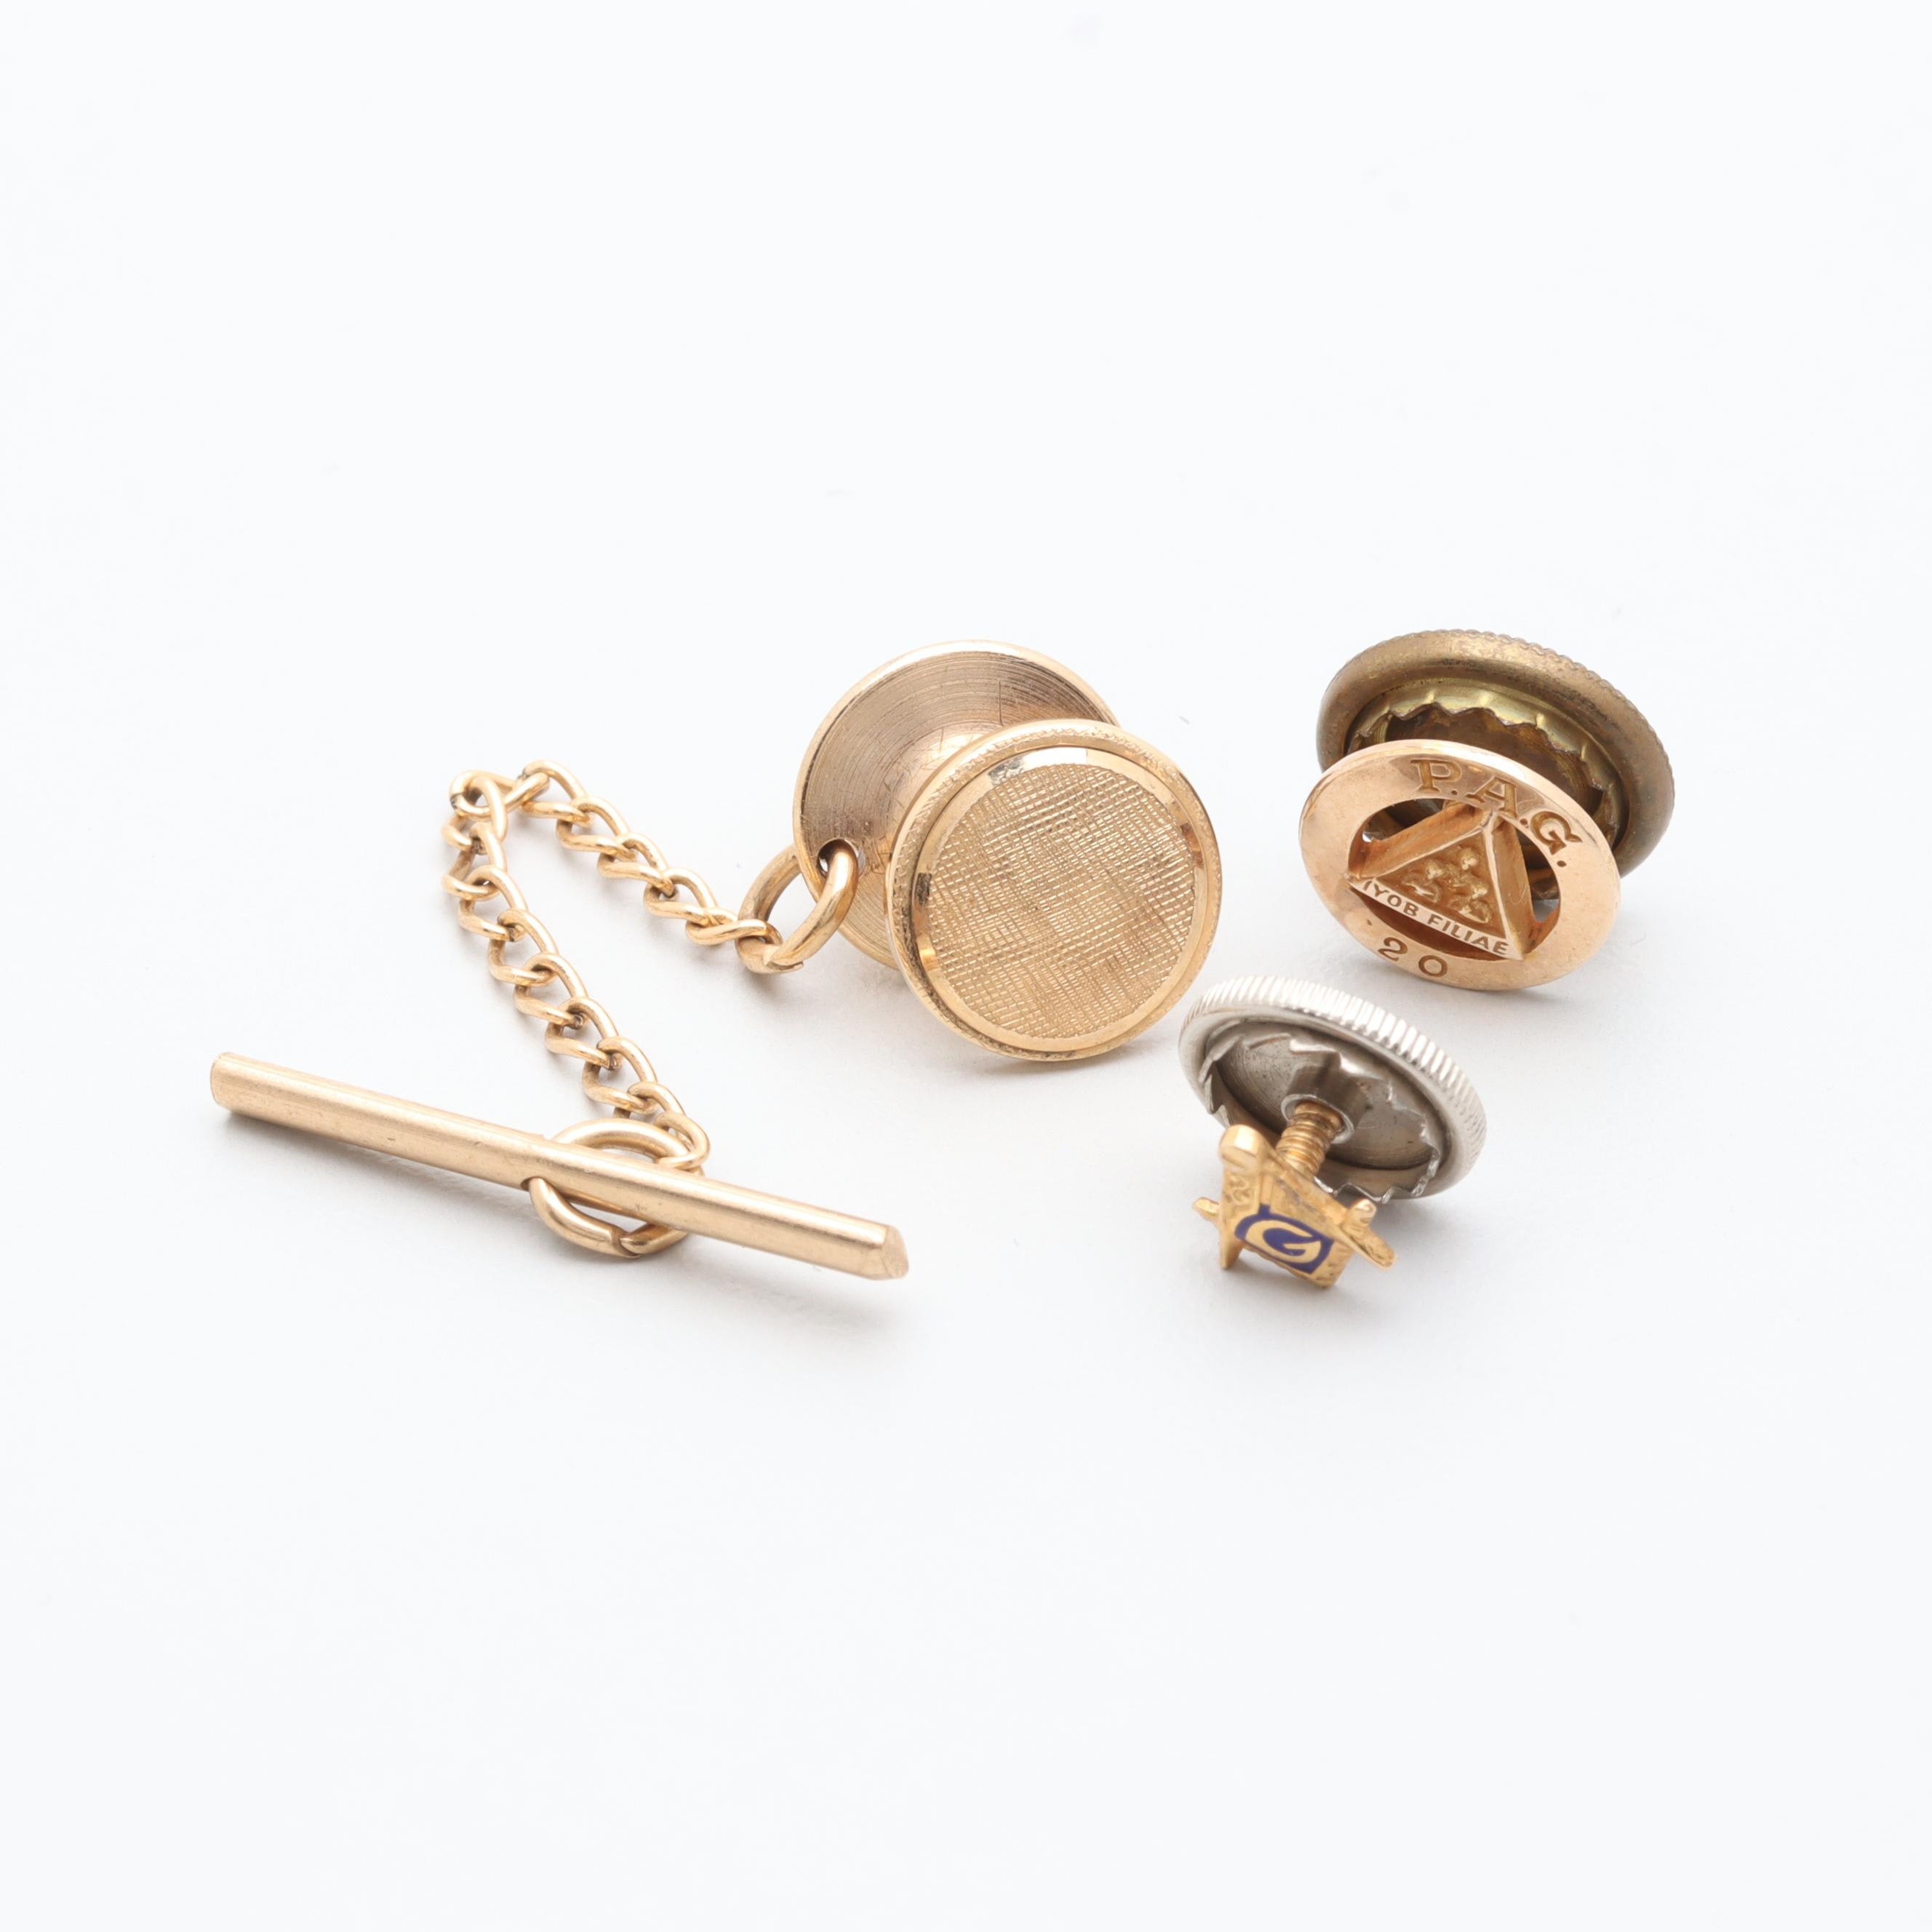 10K and 14K Yellow Gold Enamel Pins Including Freemason Emblems